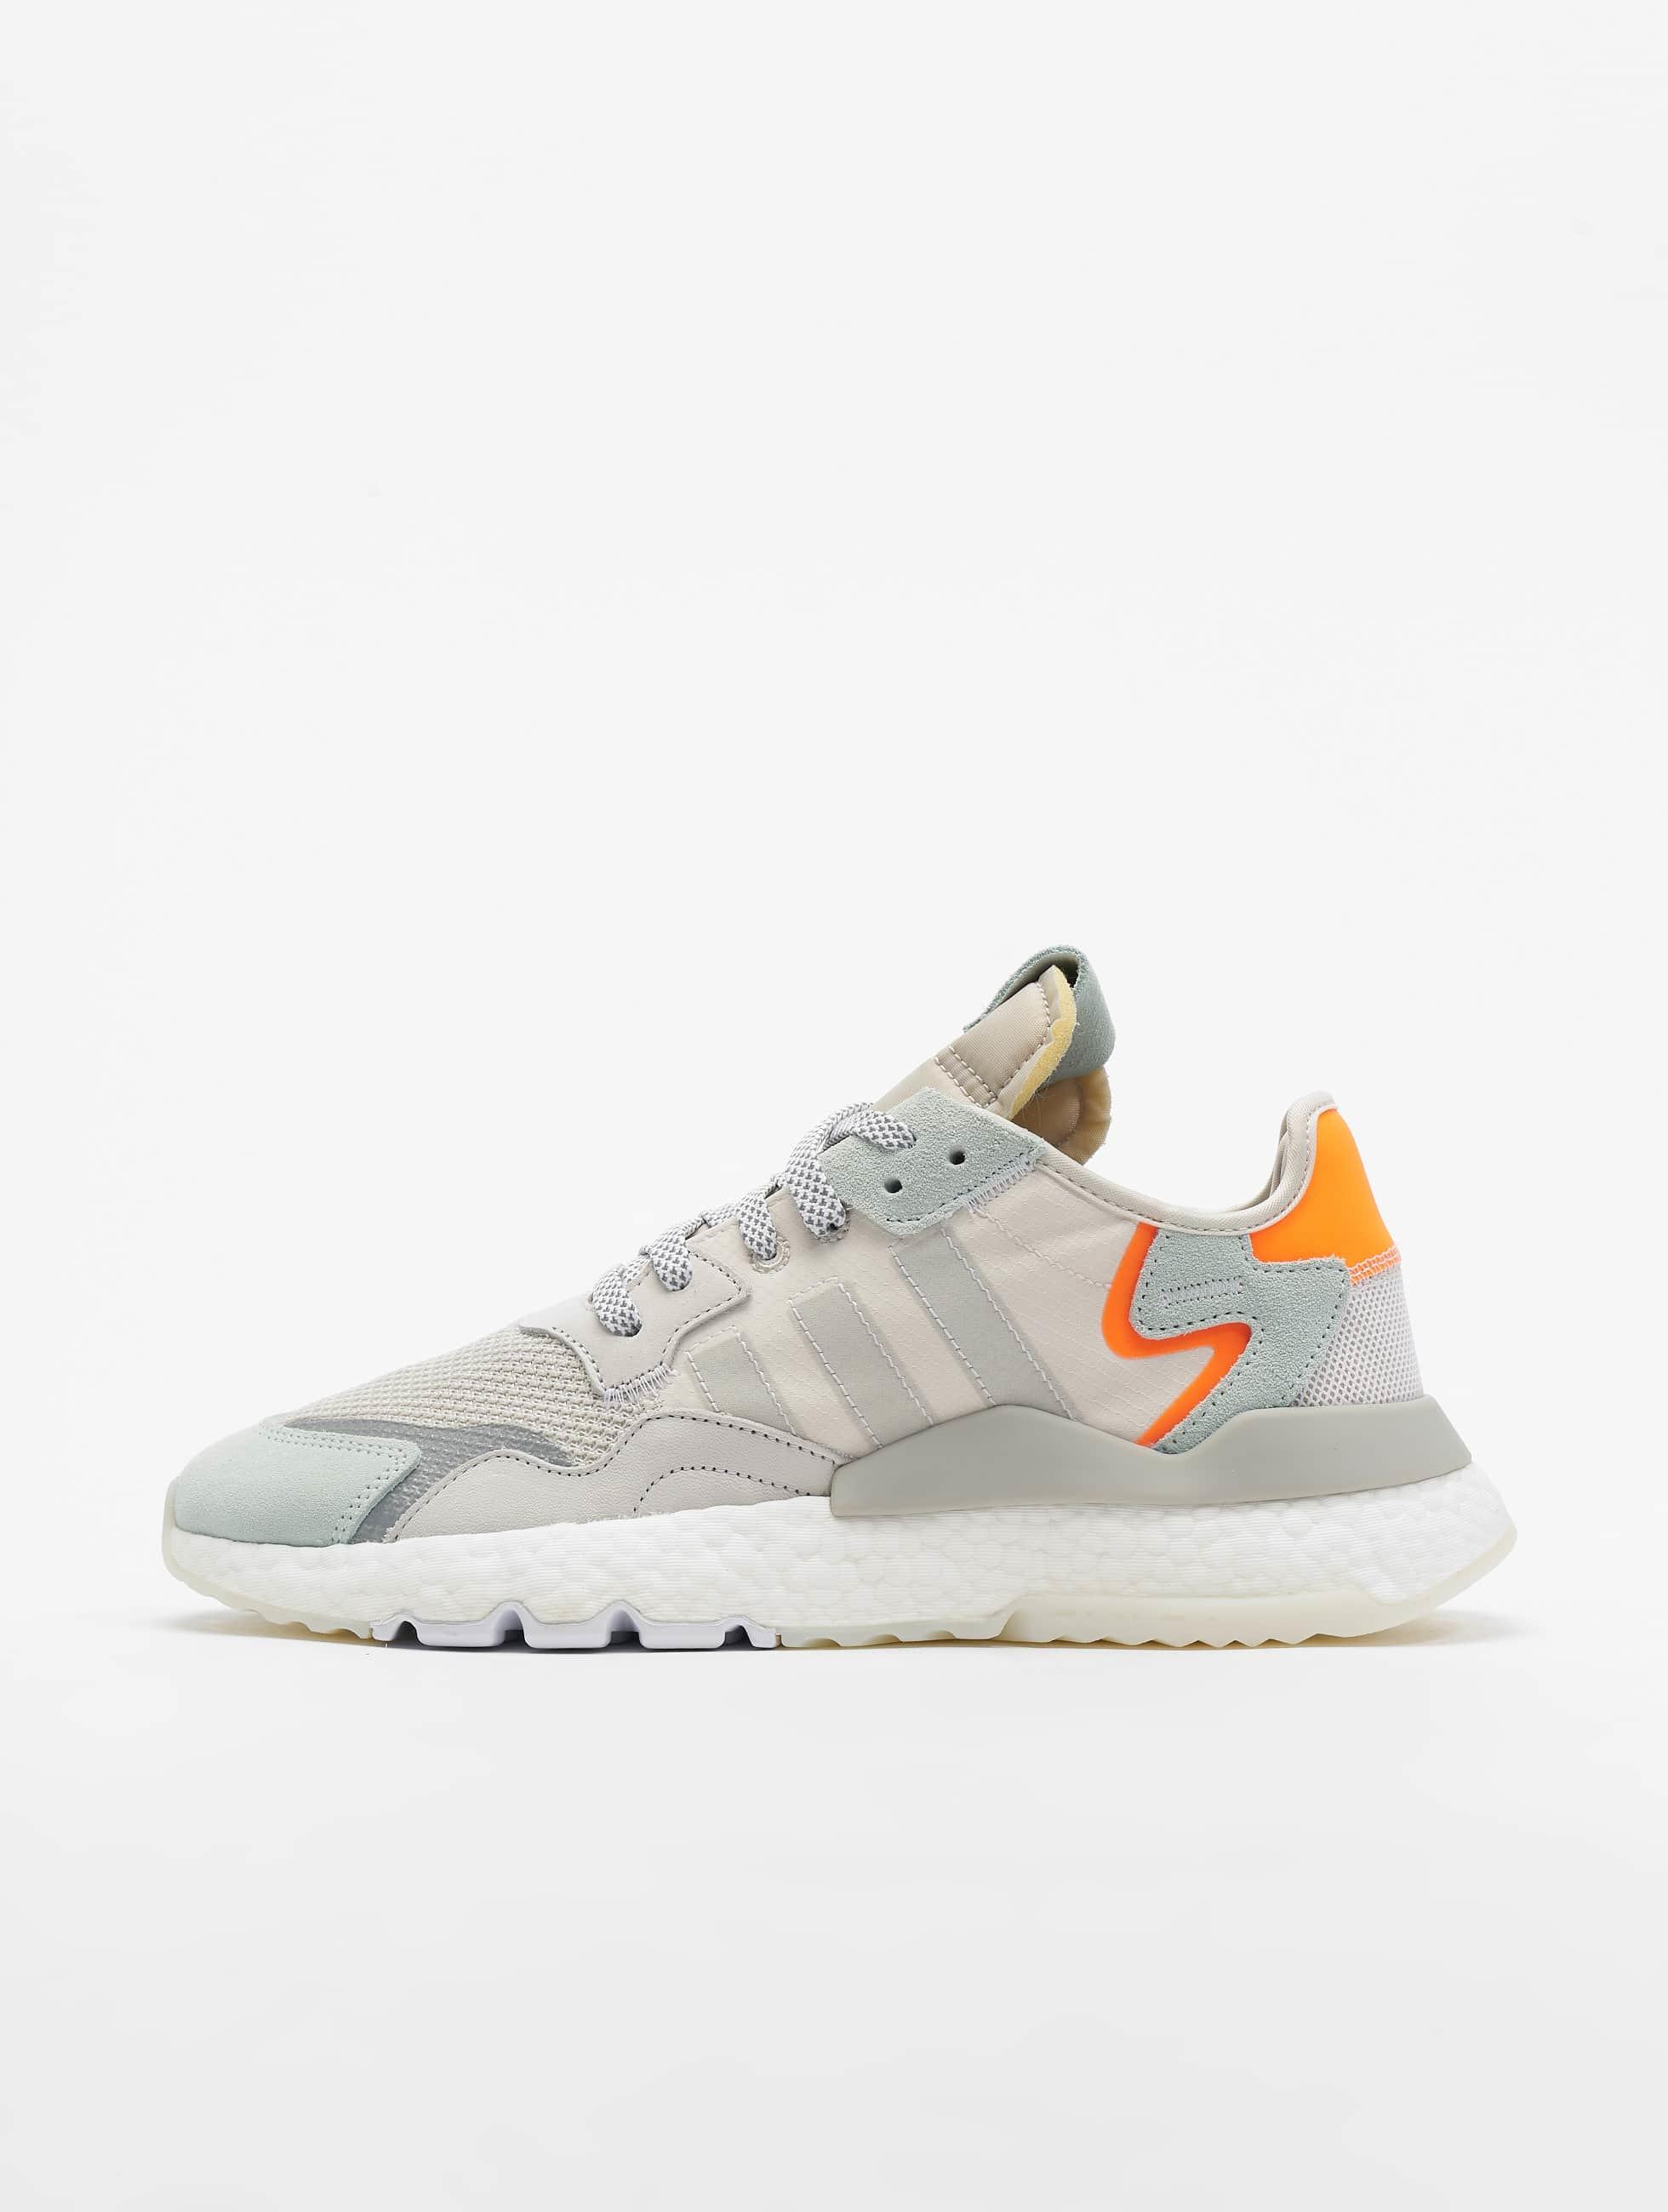 Adidas Originals Nite Jogger Sneakers Raw WhiteGrey OneVapor Green